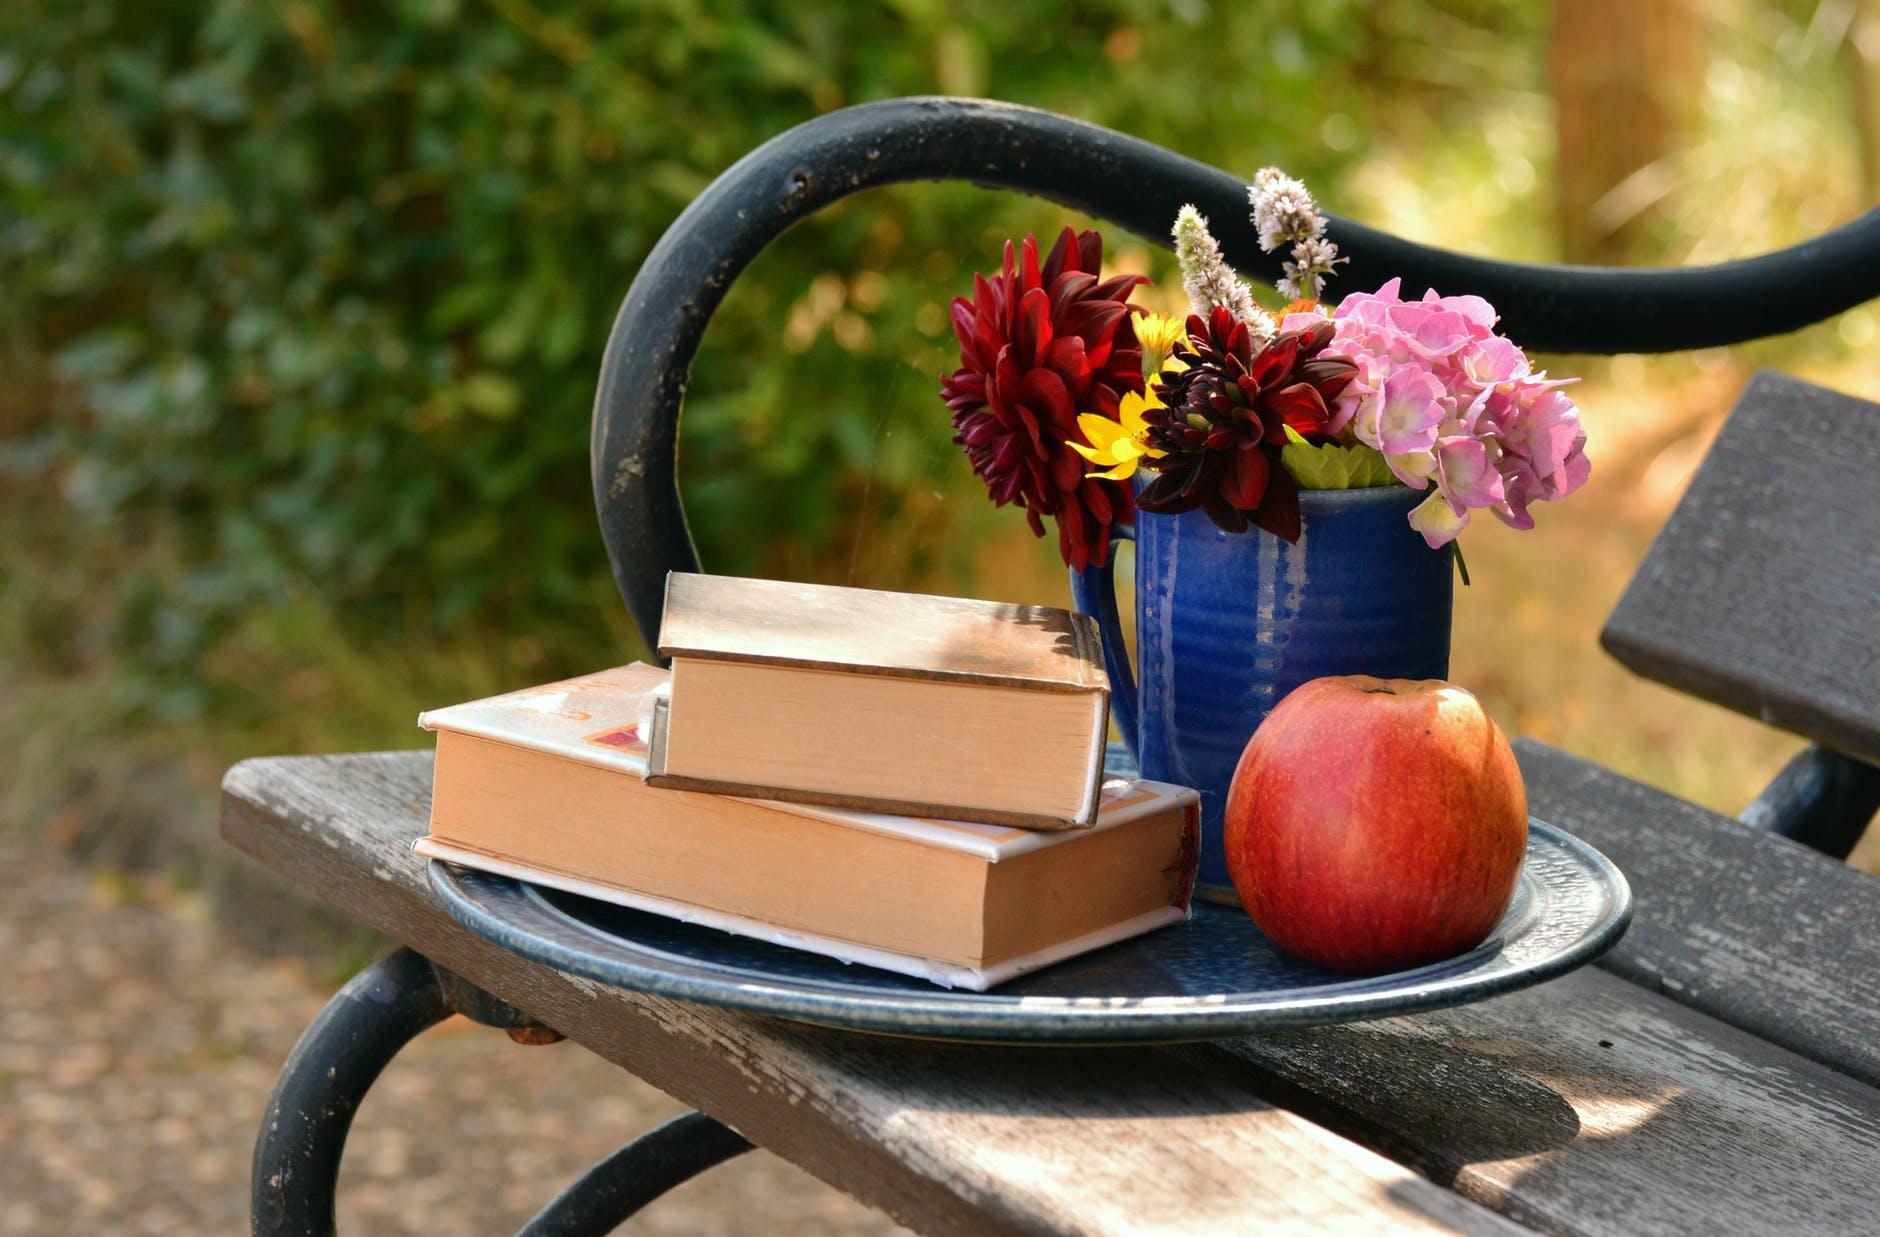 books-read-bouquet-relax-159499